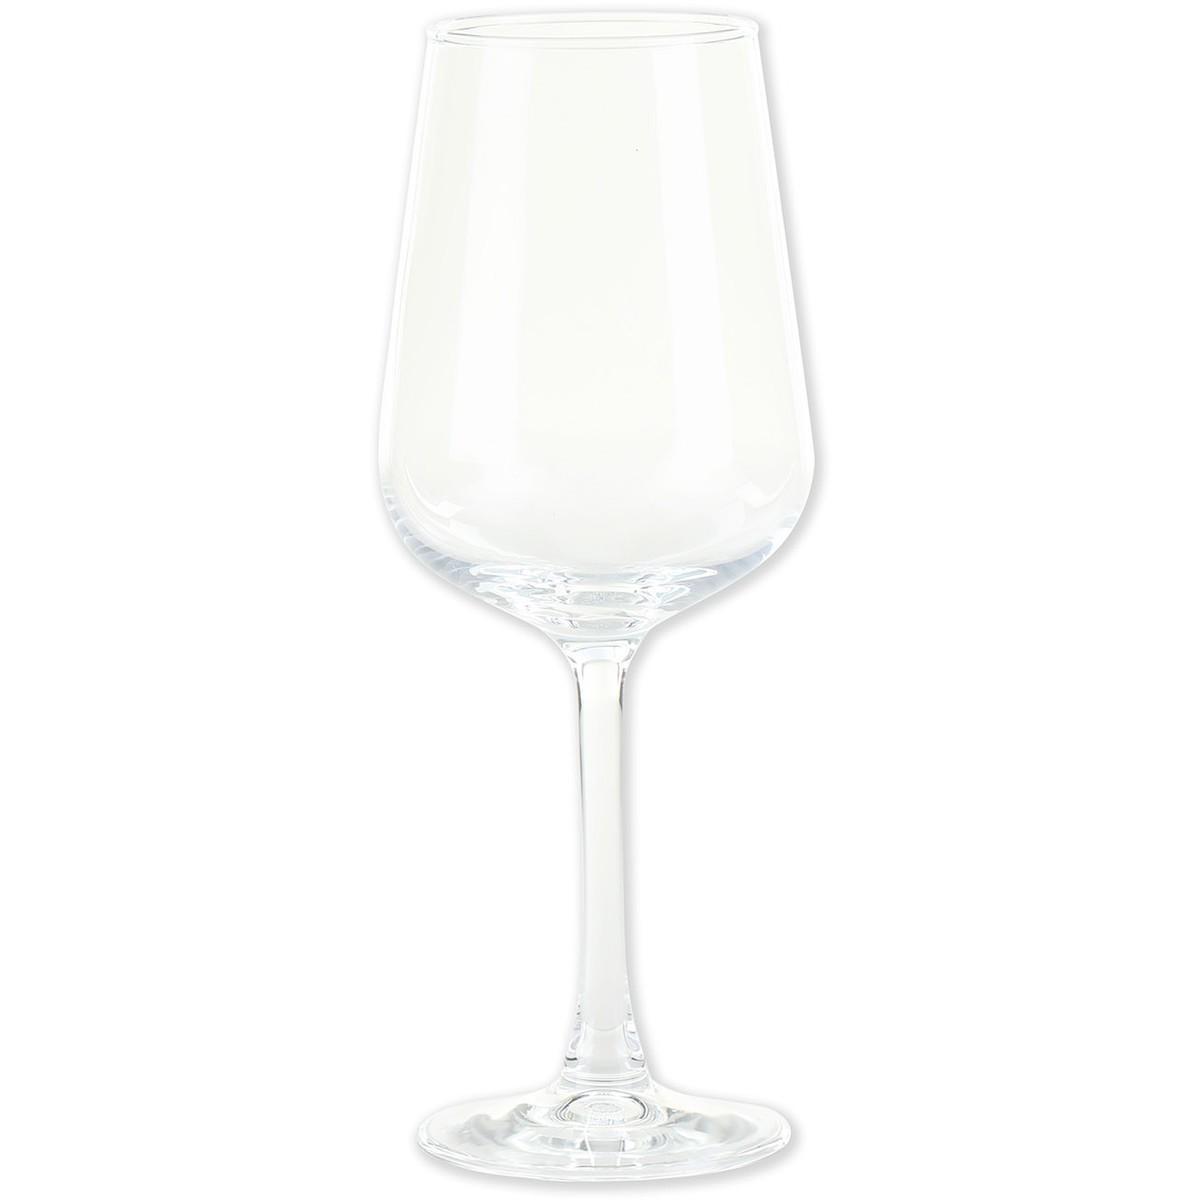 Wine glasses (standard) - Splash Events, Noosa & Sunshine Coast